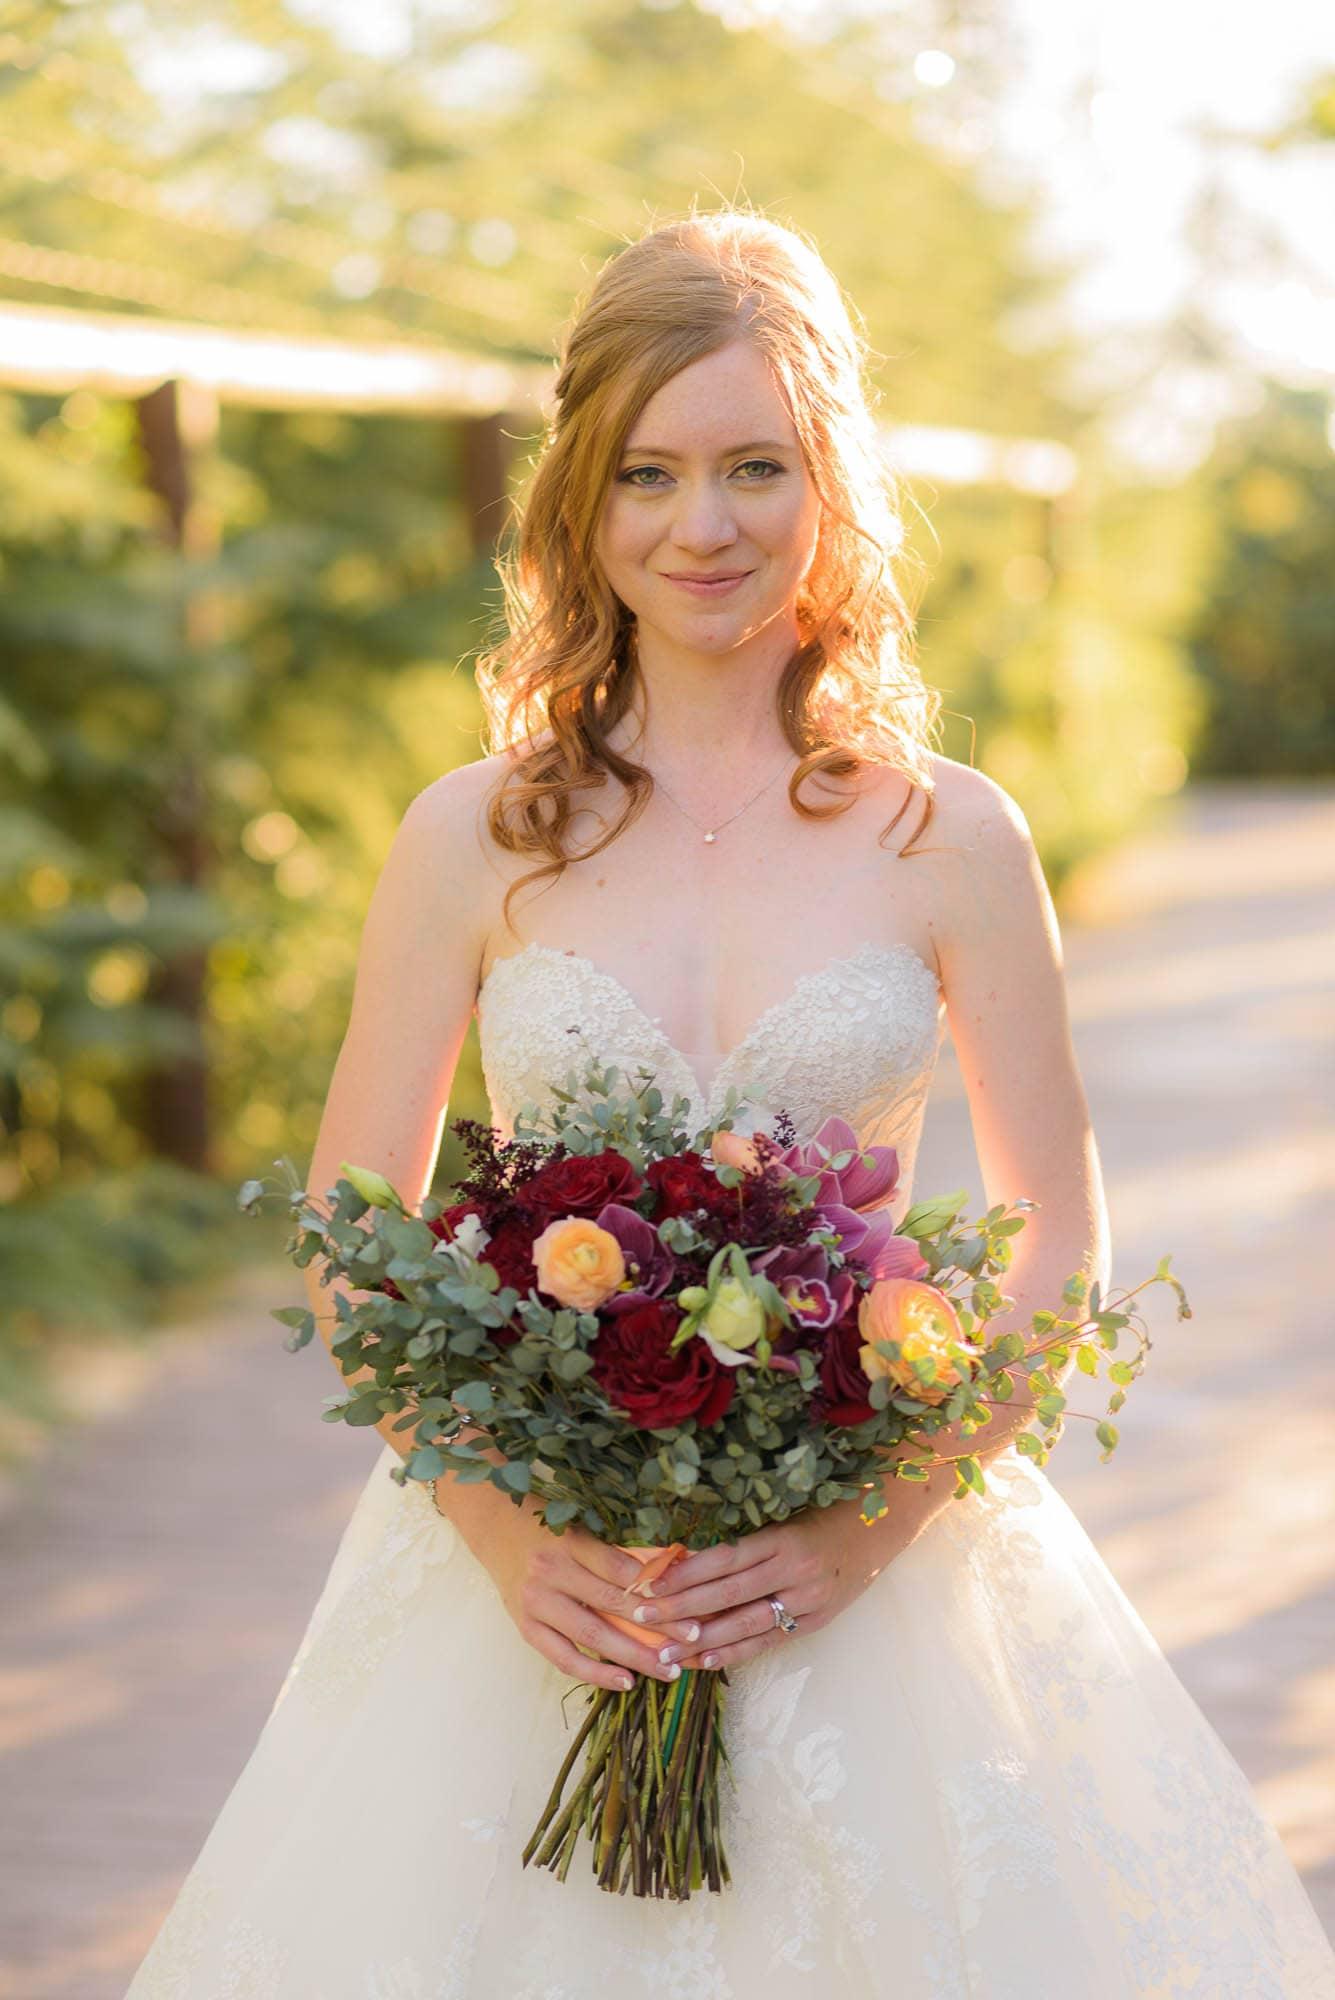 426_Alan_and_Heidi_Serendipity_Garden_Wedding_10-27-2018